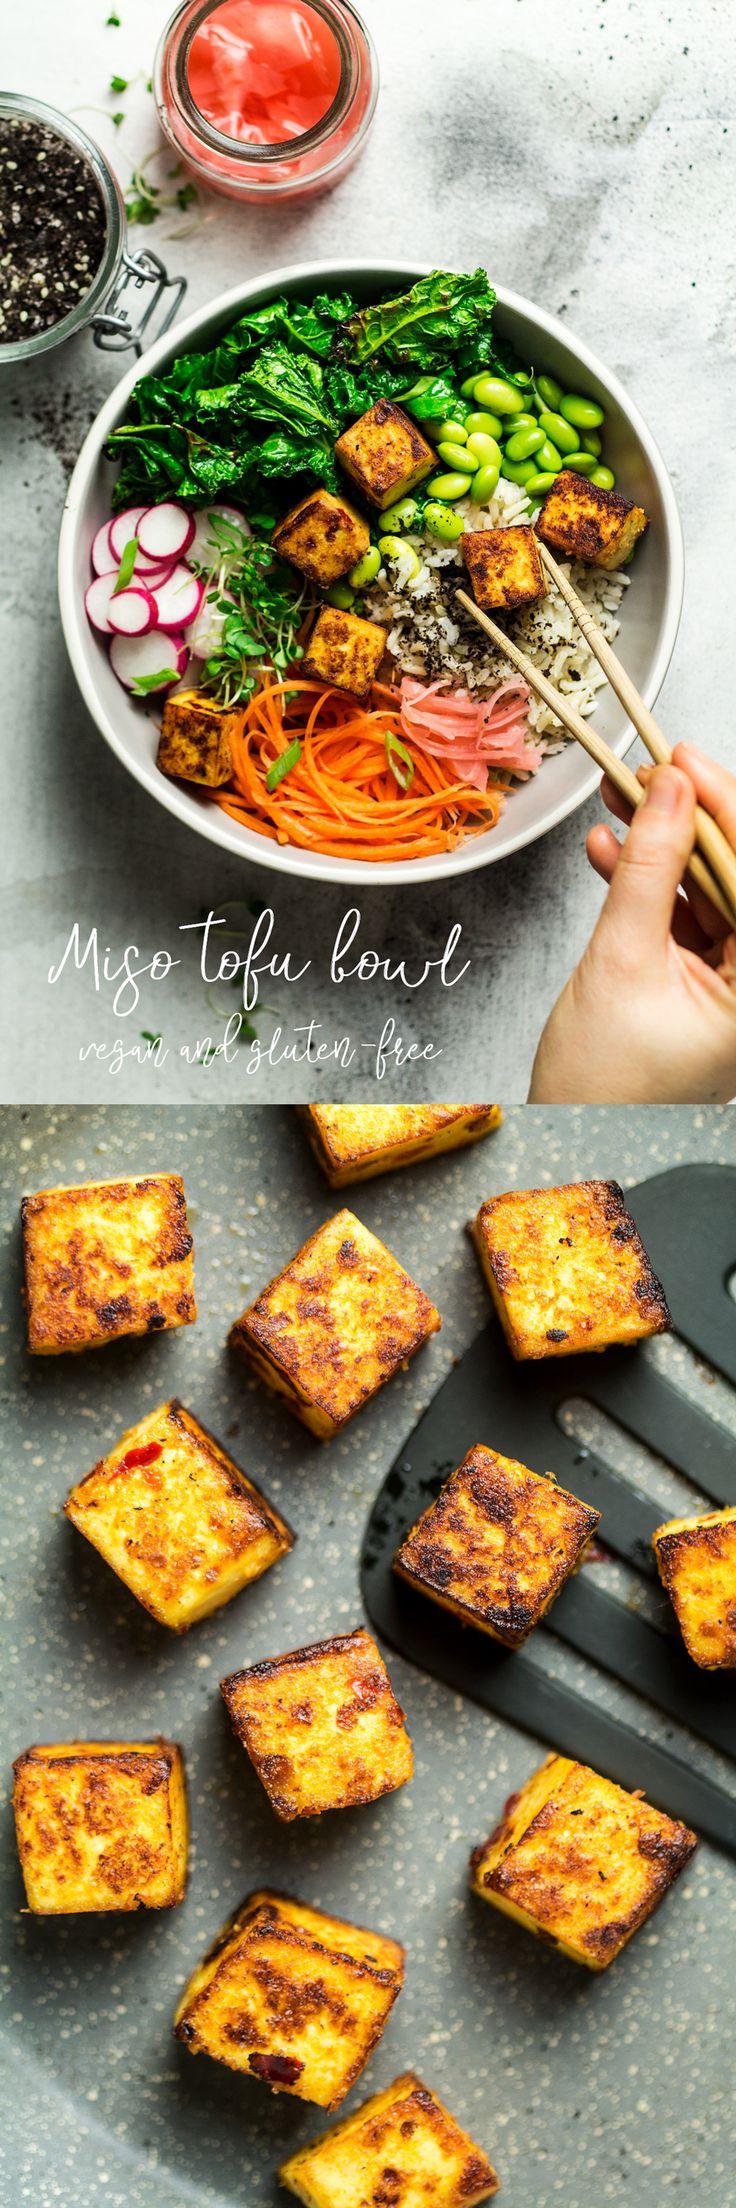 miso tofu bowl